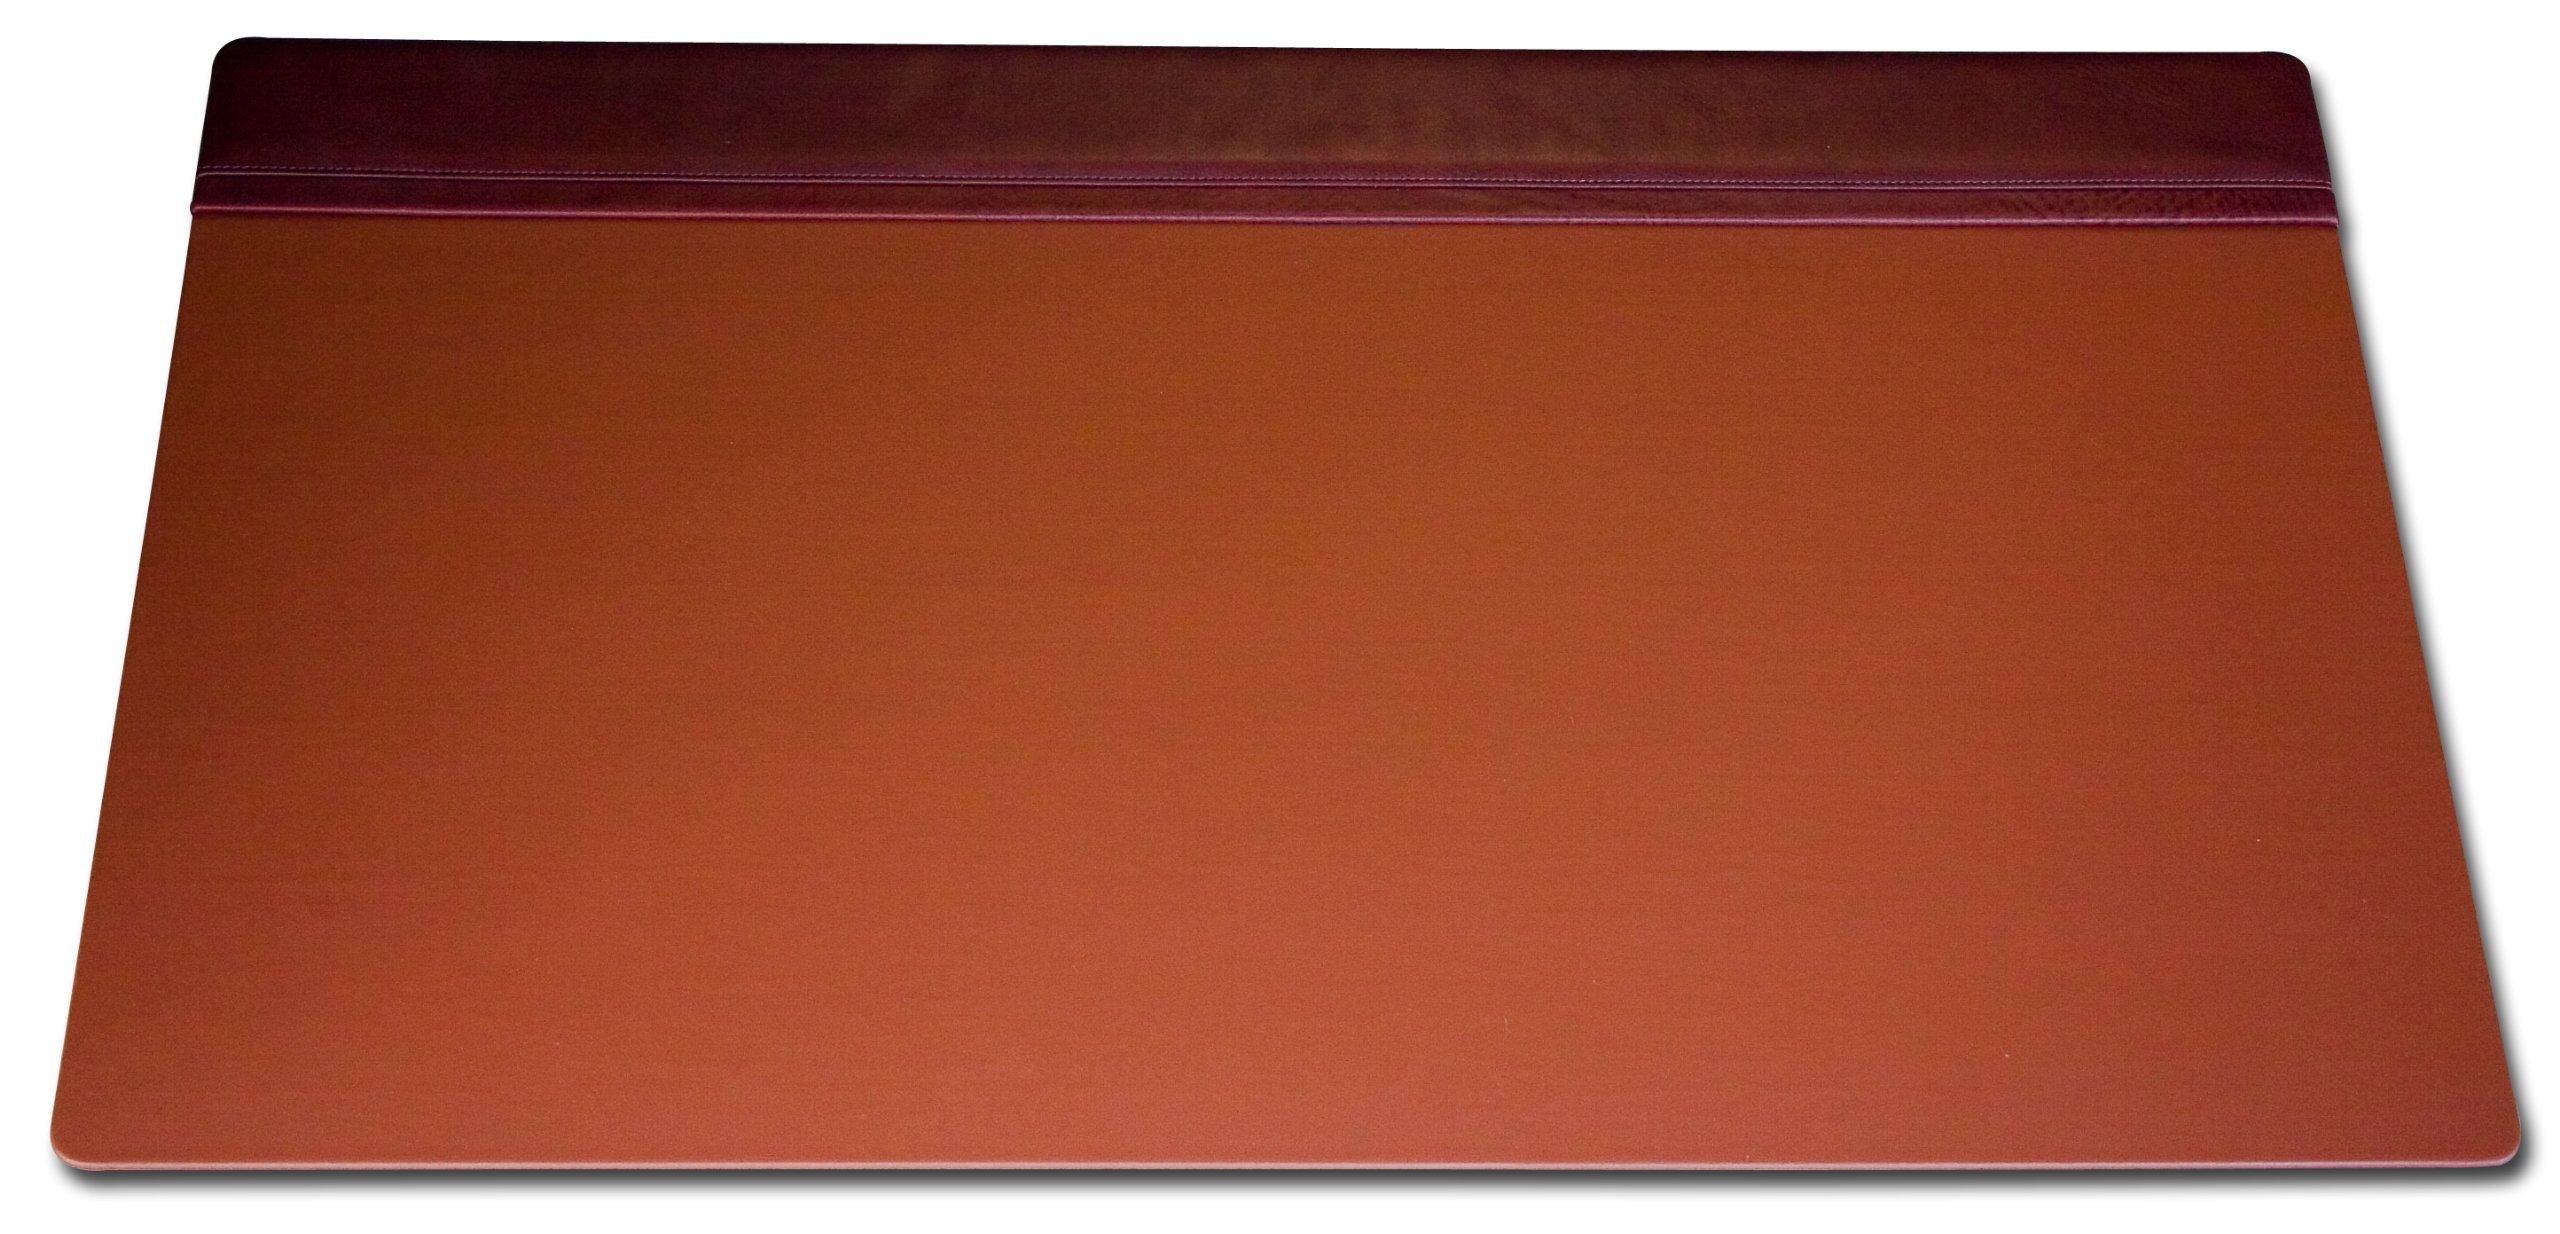 Dacasso Mocha Brown Top-rail Pad, 34 by 20-Inch